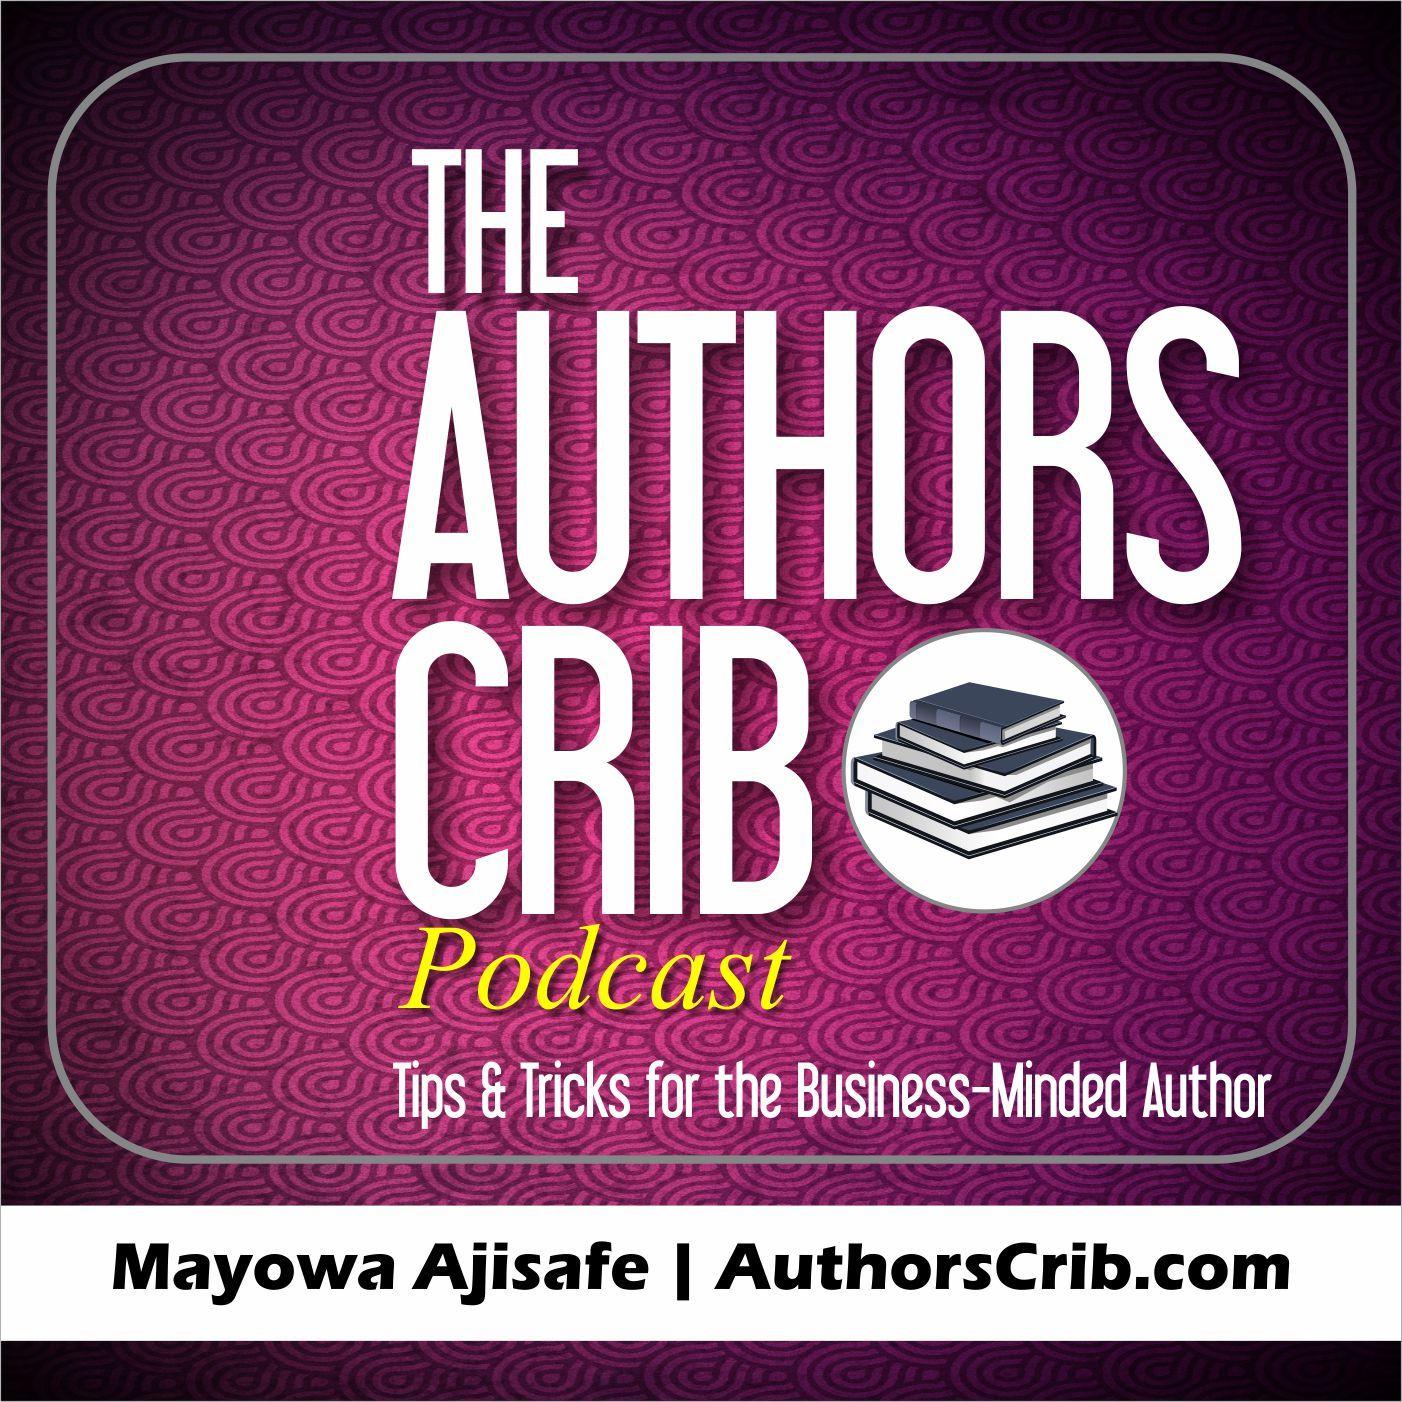 How To Market Your Way To No 1 Amazon Bestseller With Rachel Abbott | Authors Crib